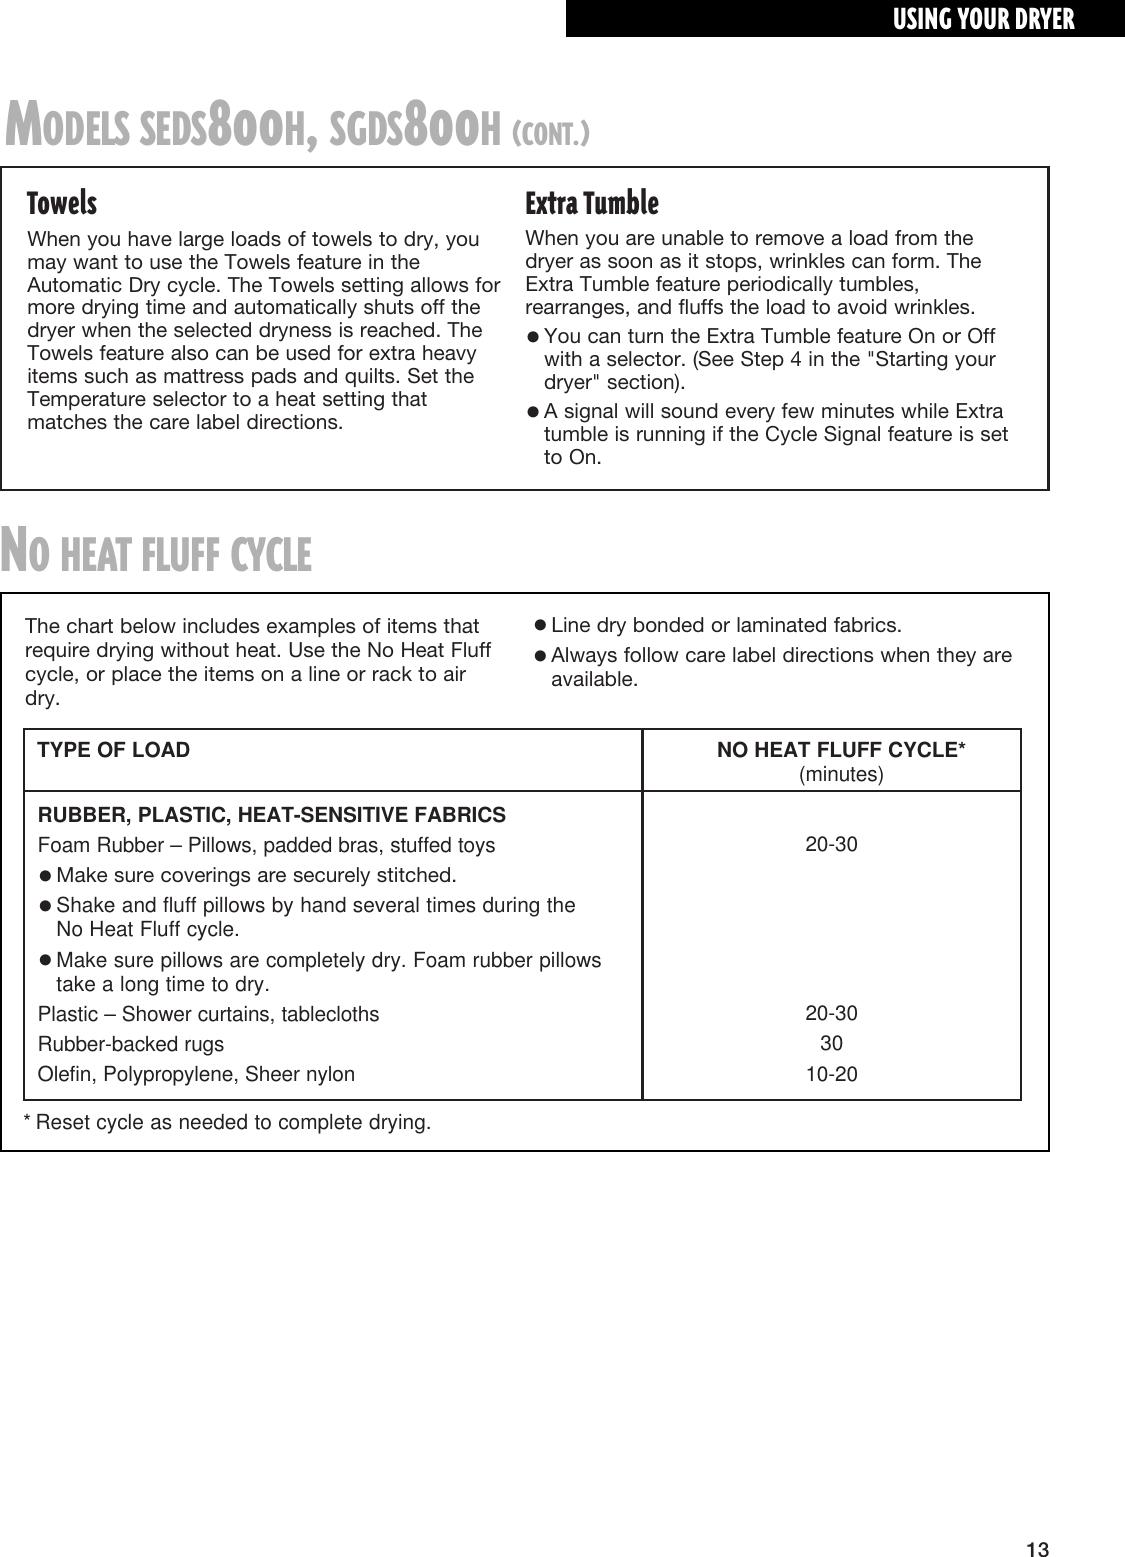 Kirkland Signature 3406079 Users Manual V10 EN (c37)